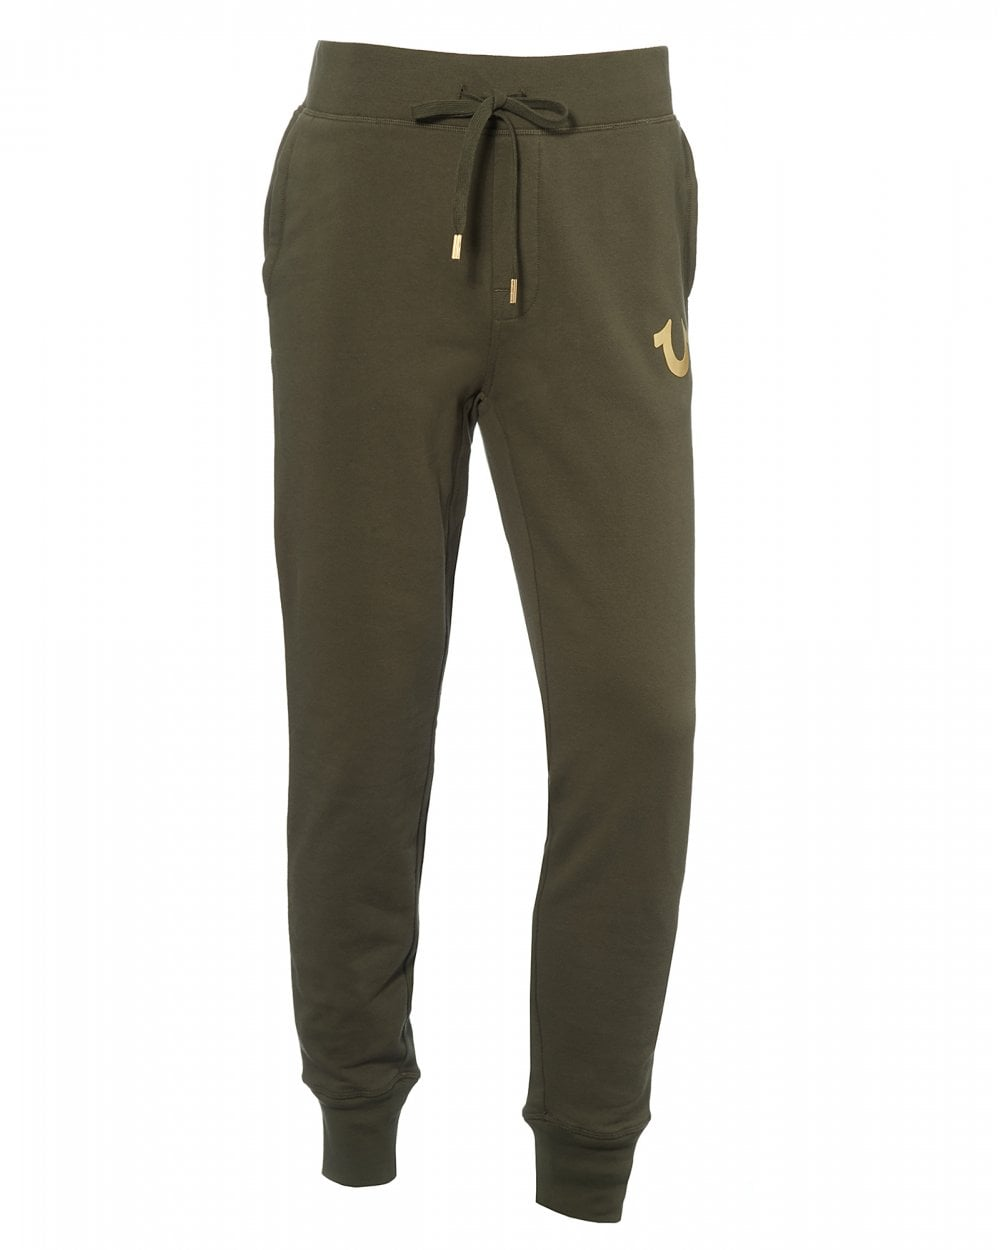 976afc655b True Religion Mens Logo Cuffed Joggers, Military Green Sweatpants